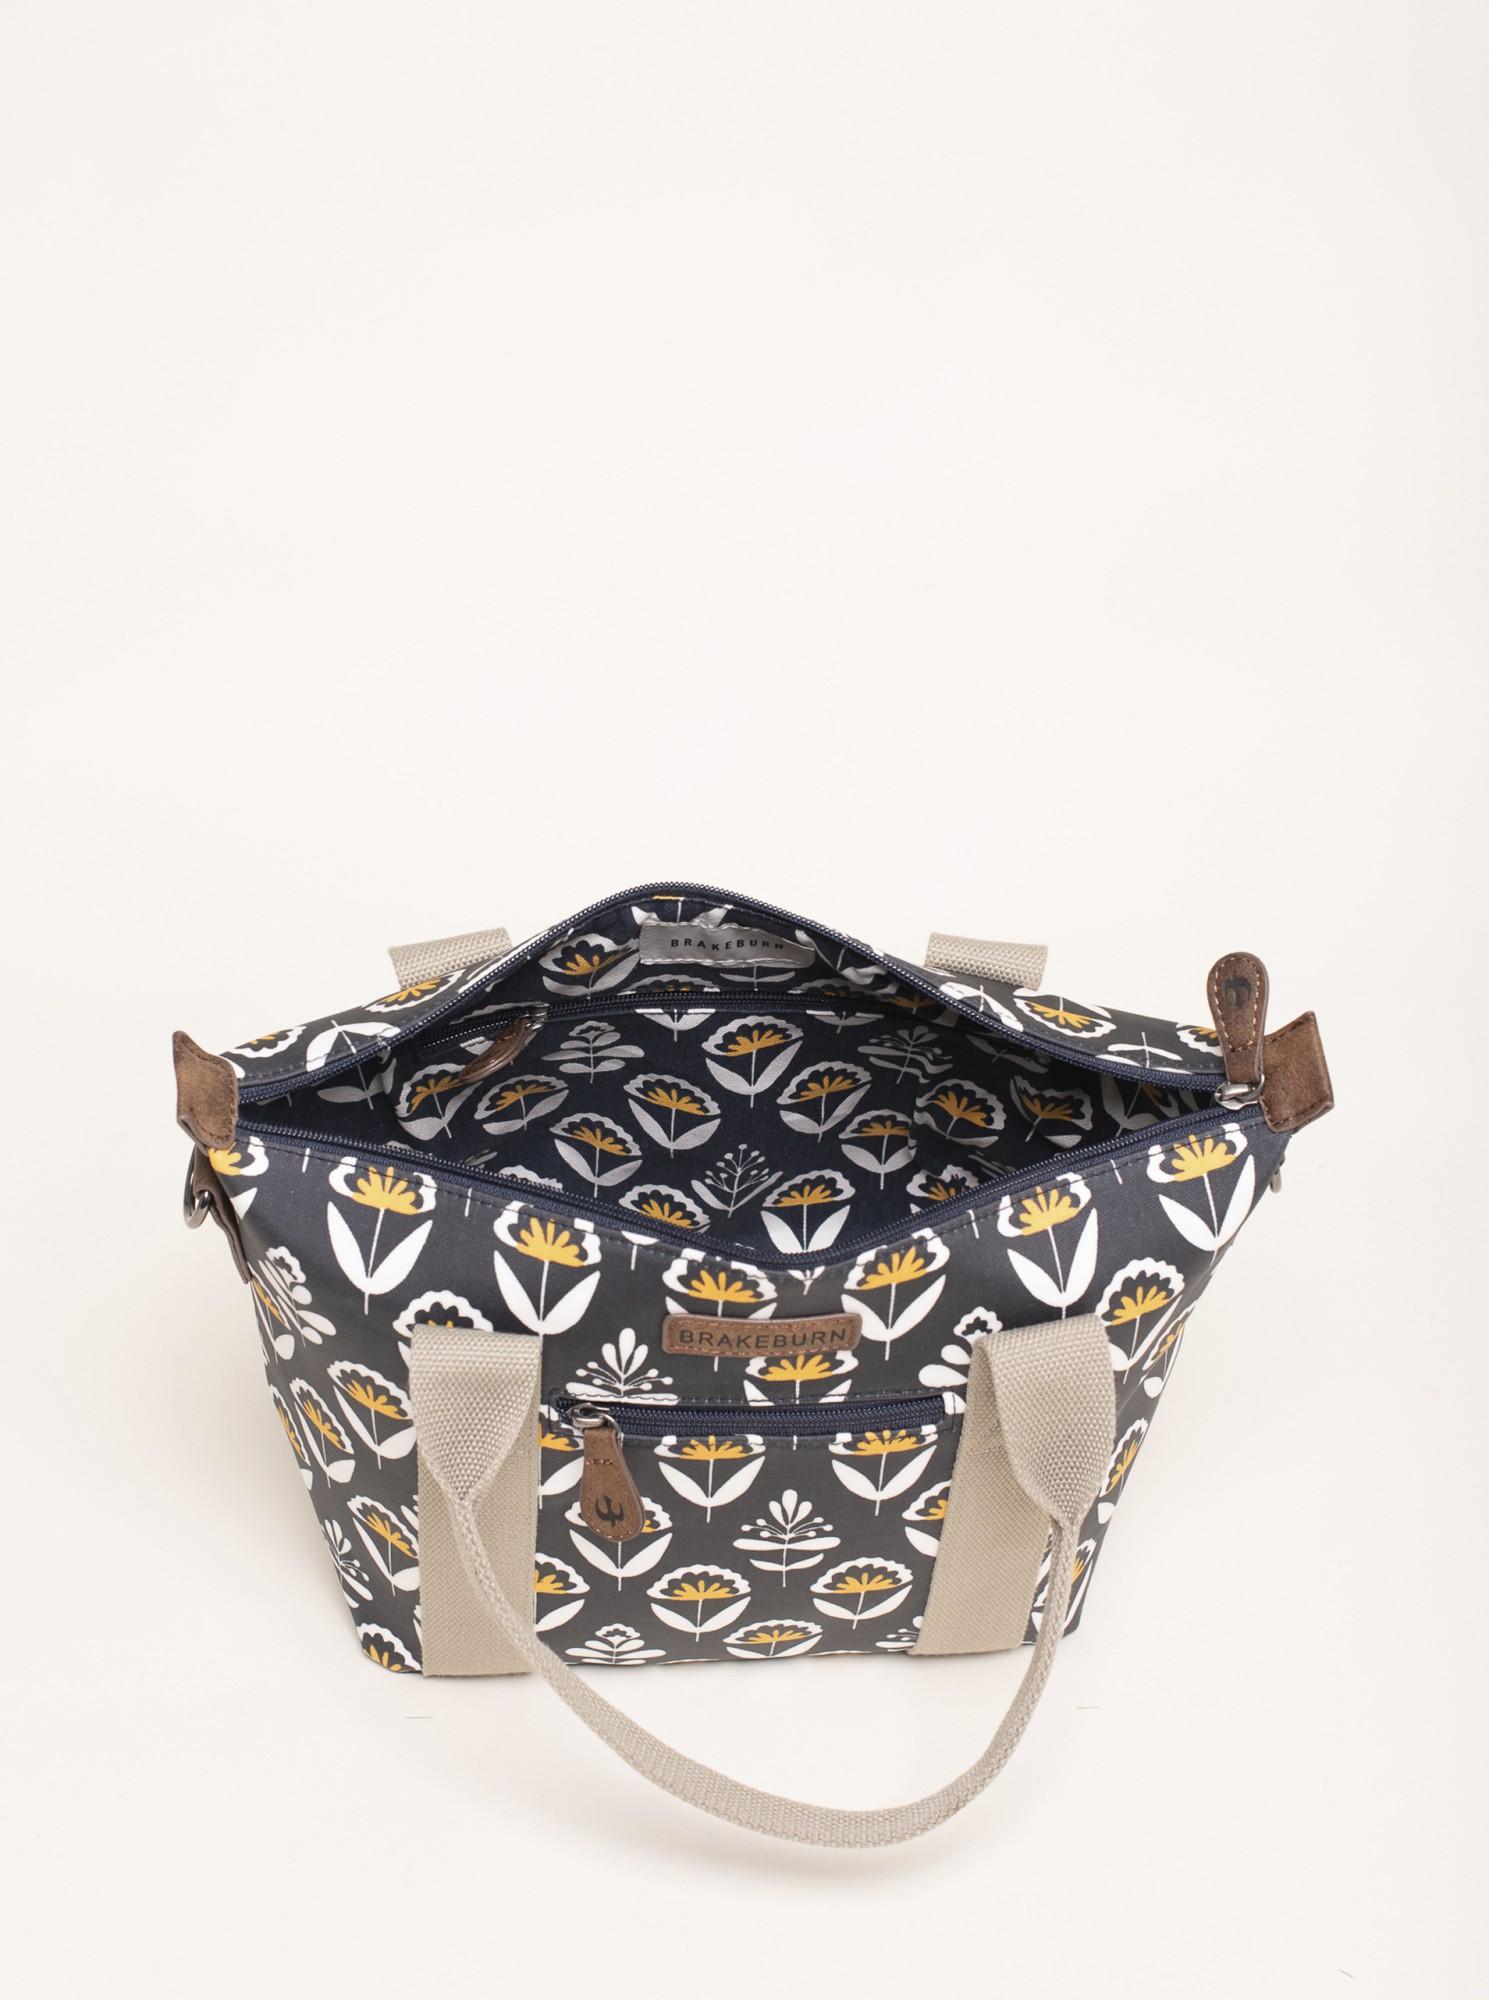 Brakeburn geanta